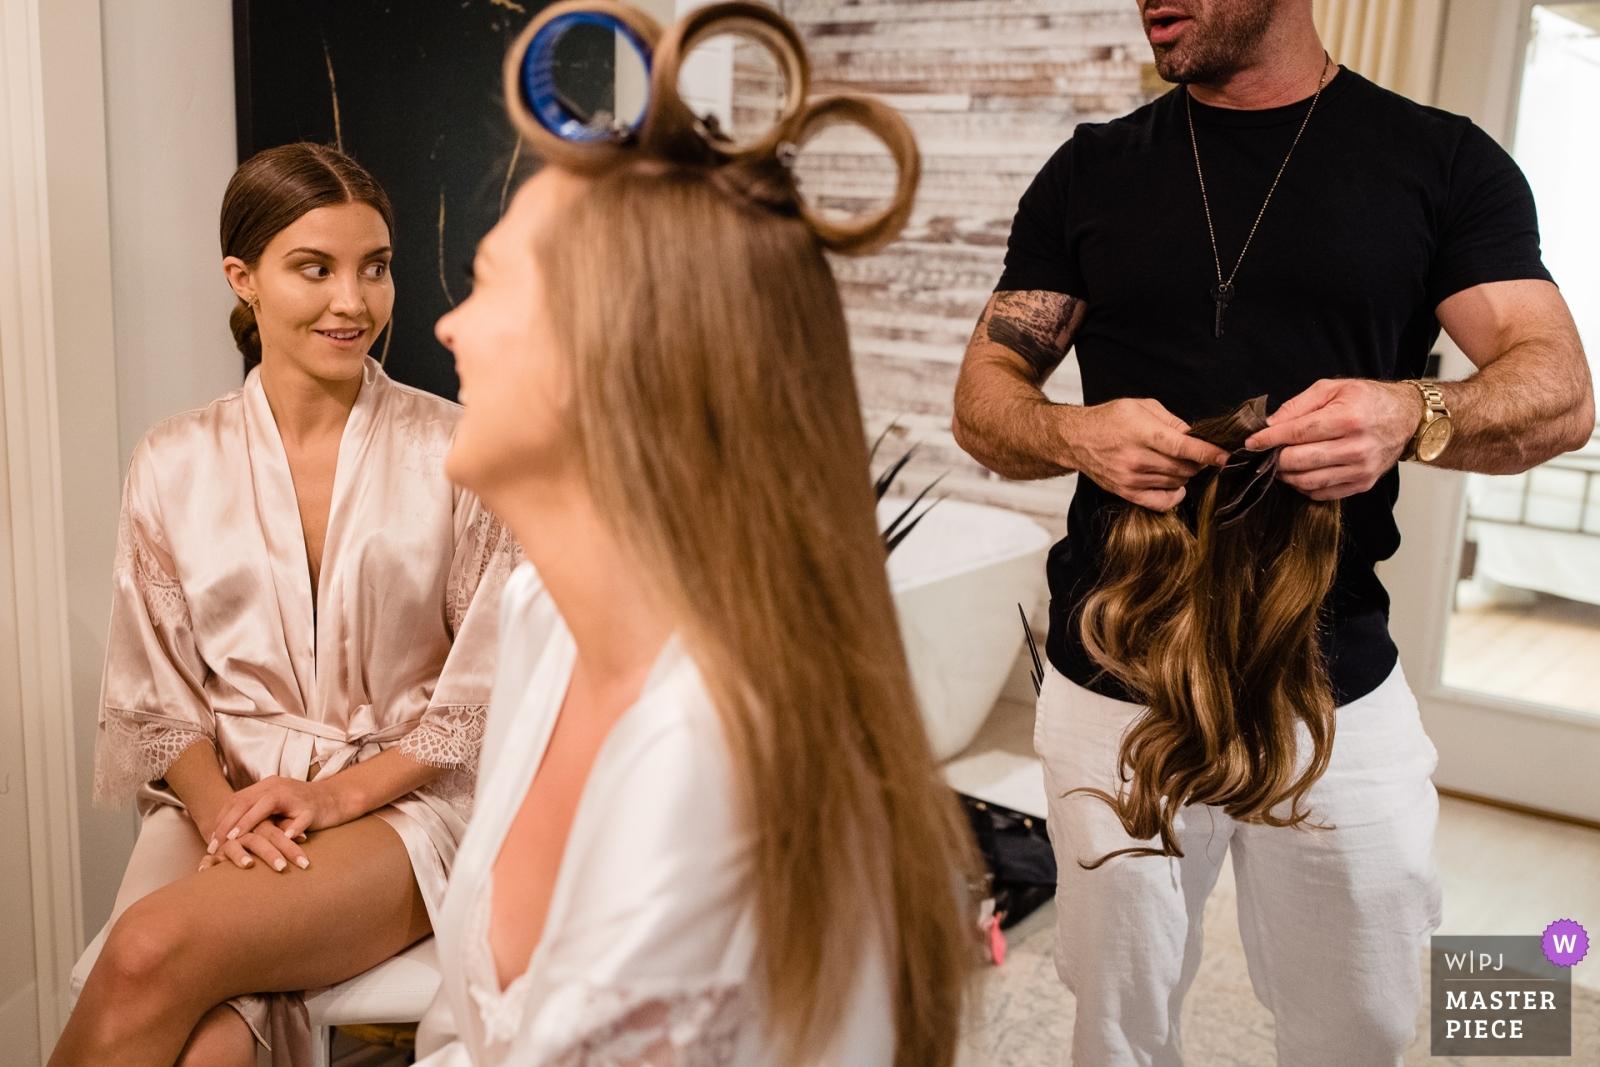 fake hair to be added to bride's real hair - Missoula, Montana Wedding Photography -  | Foster Creek Farm, Belgrade, Montana